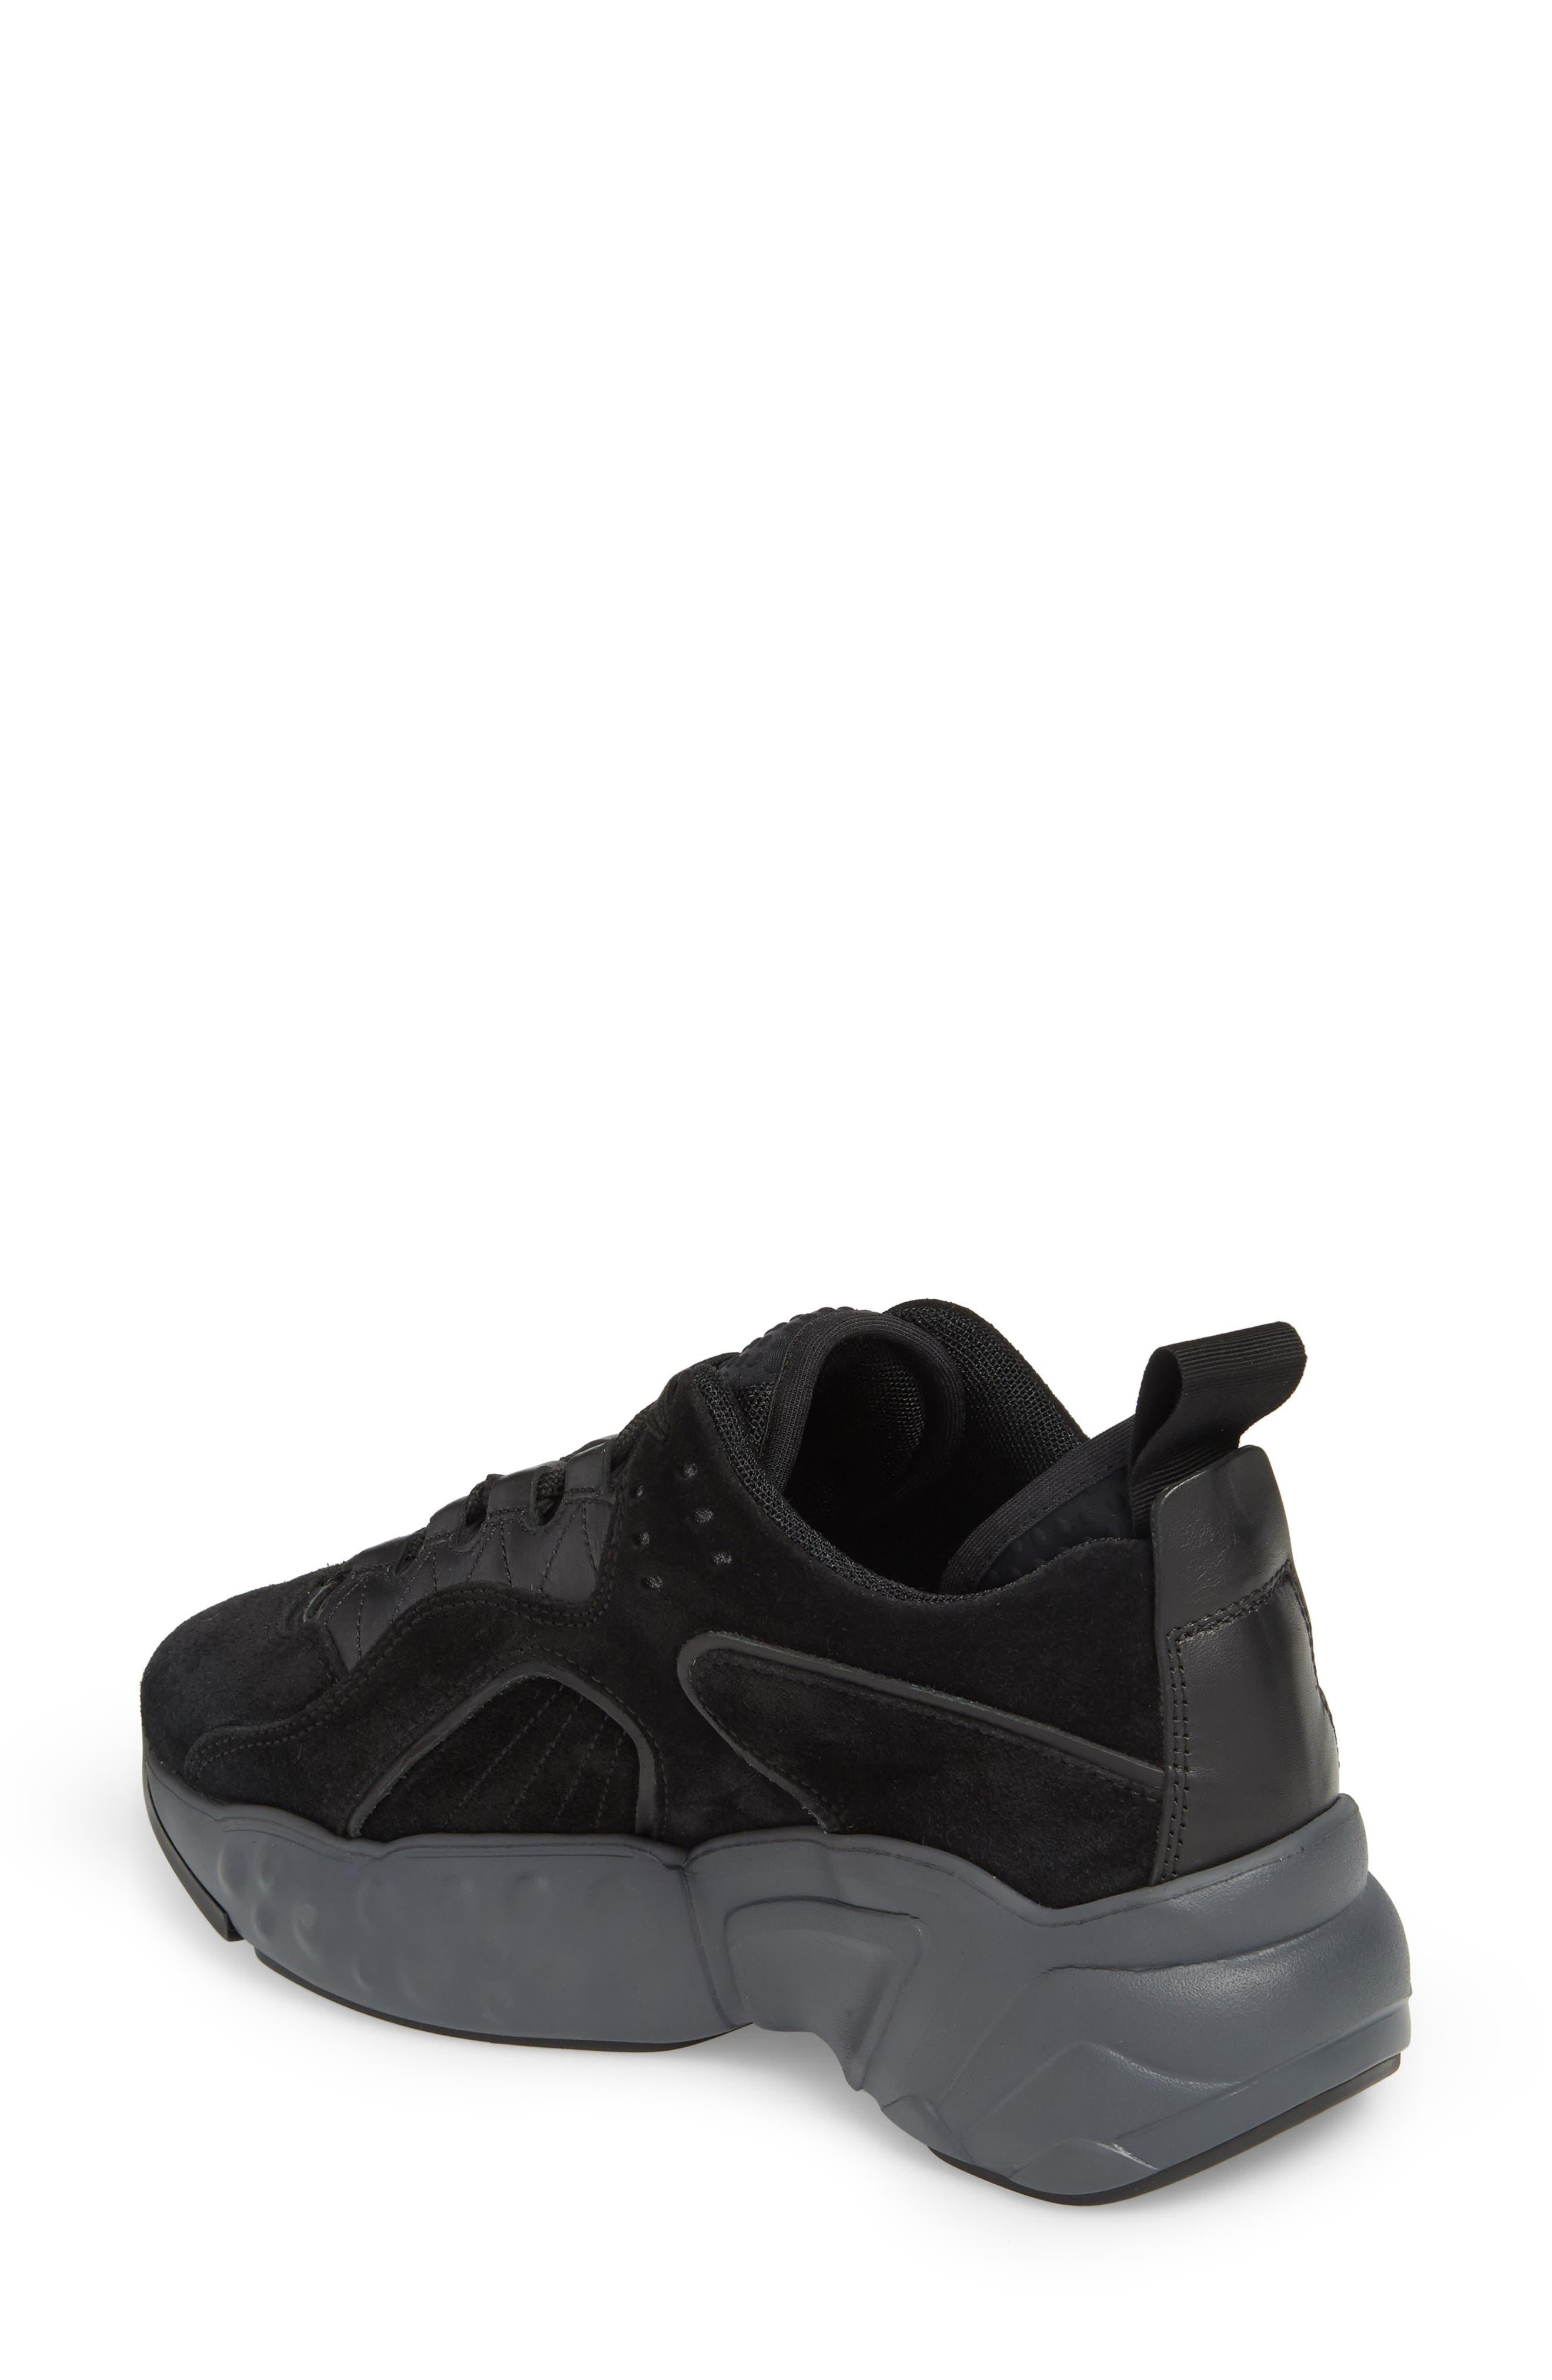 ACNE STUDIOS, Manhattan Sneaker, Alternate thumbnail 2, color, MULTI BLACK